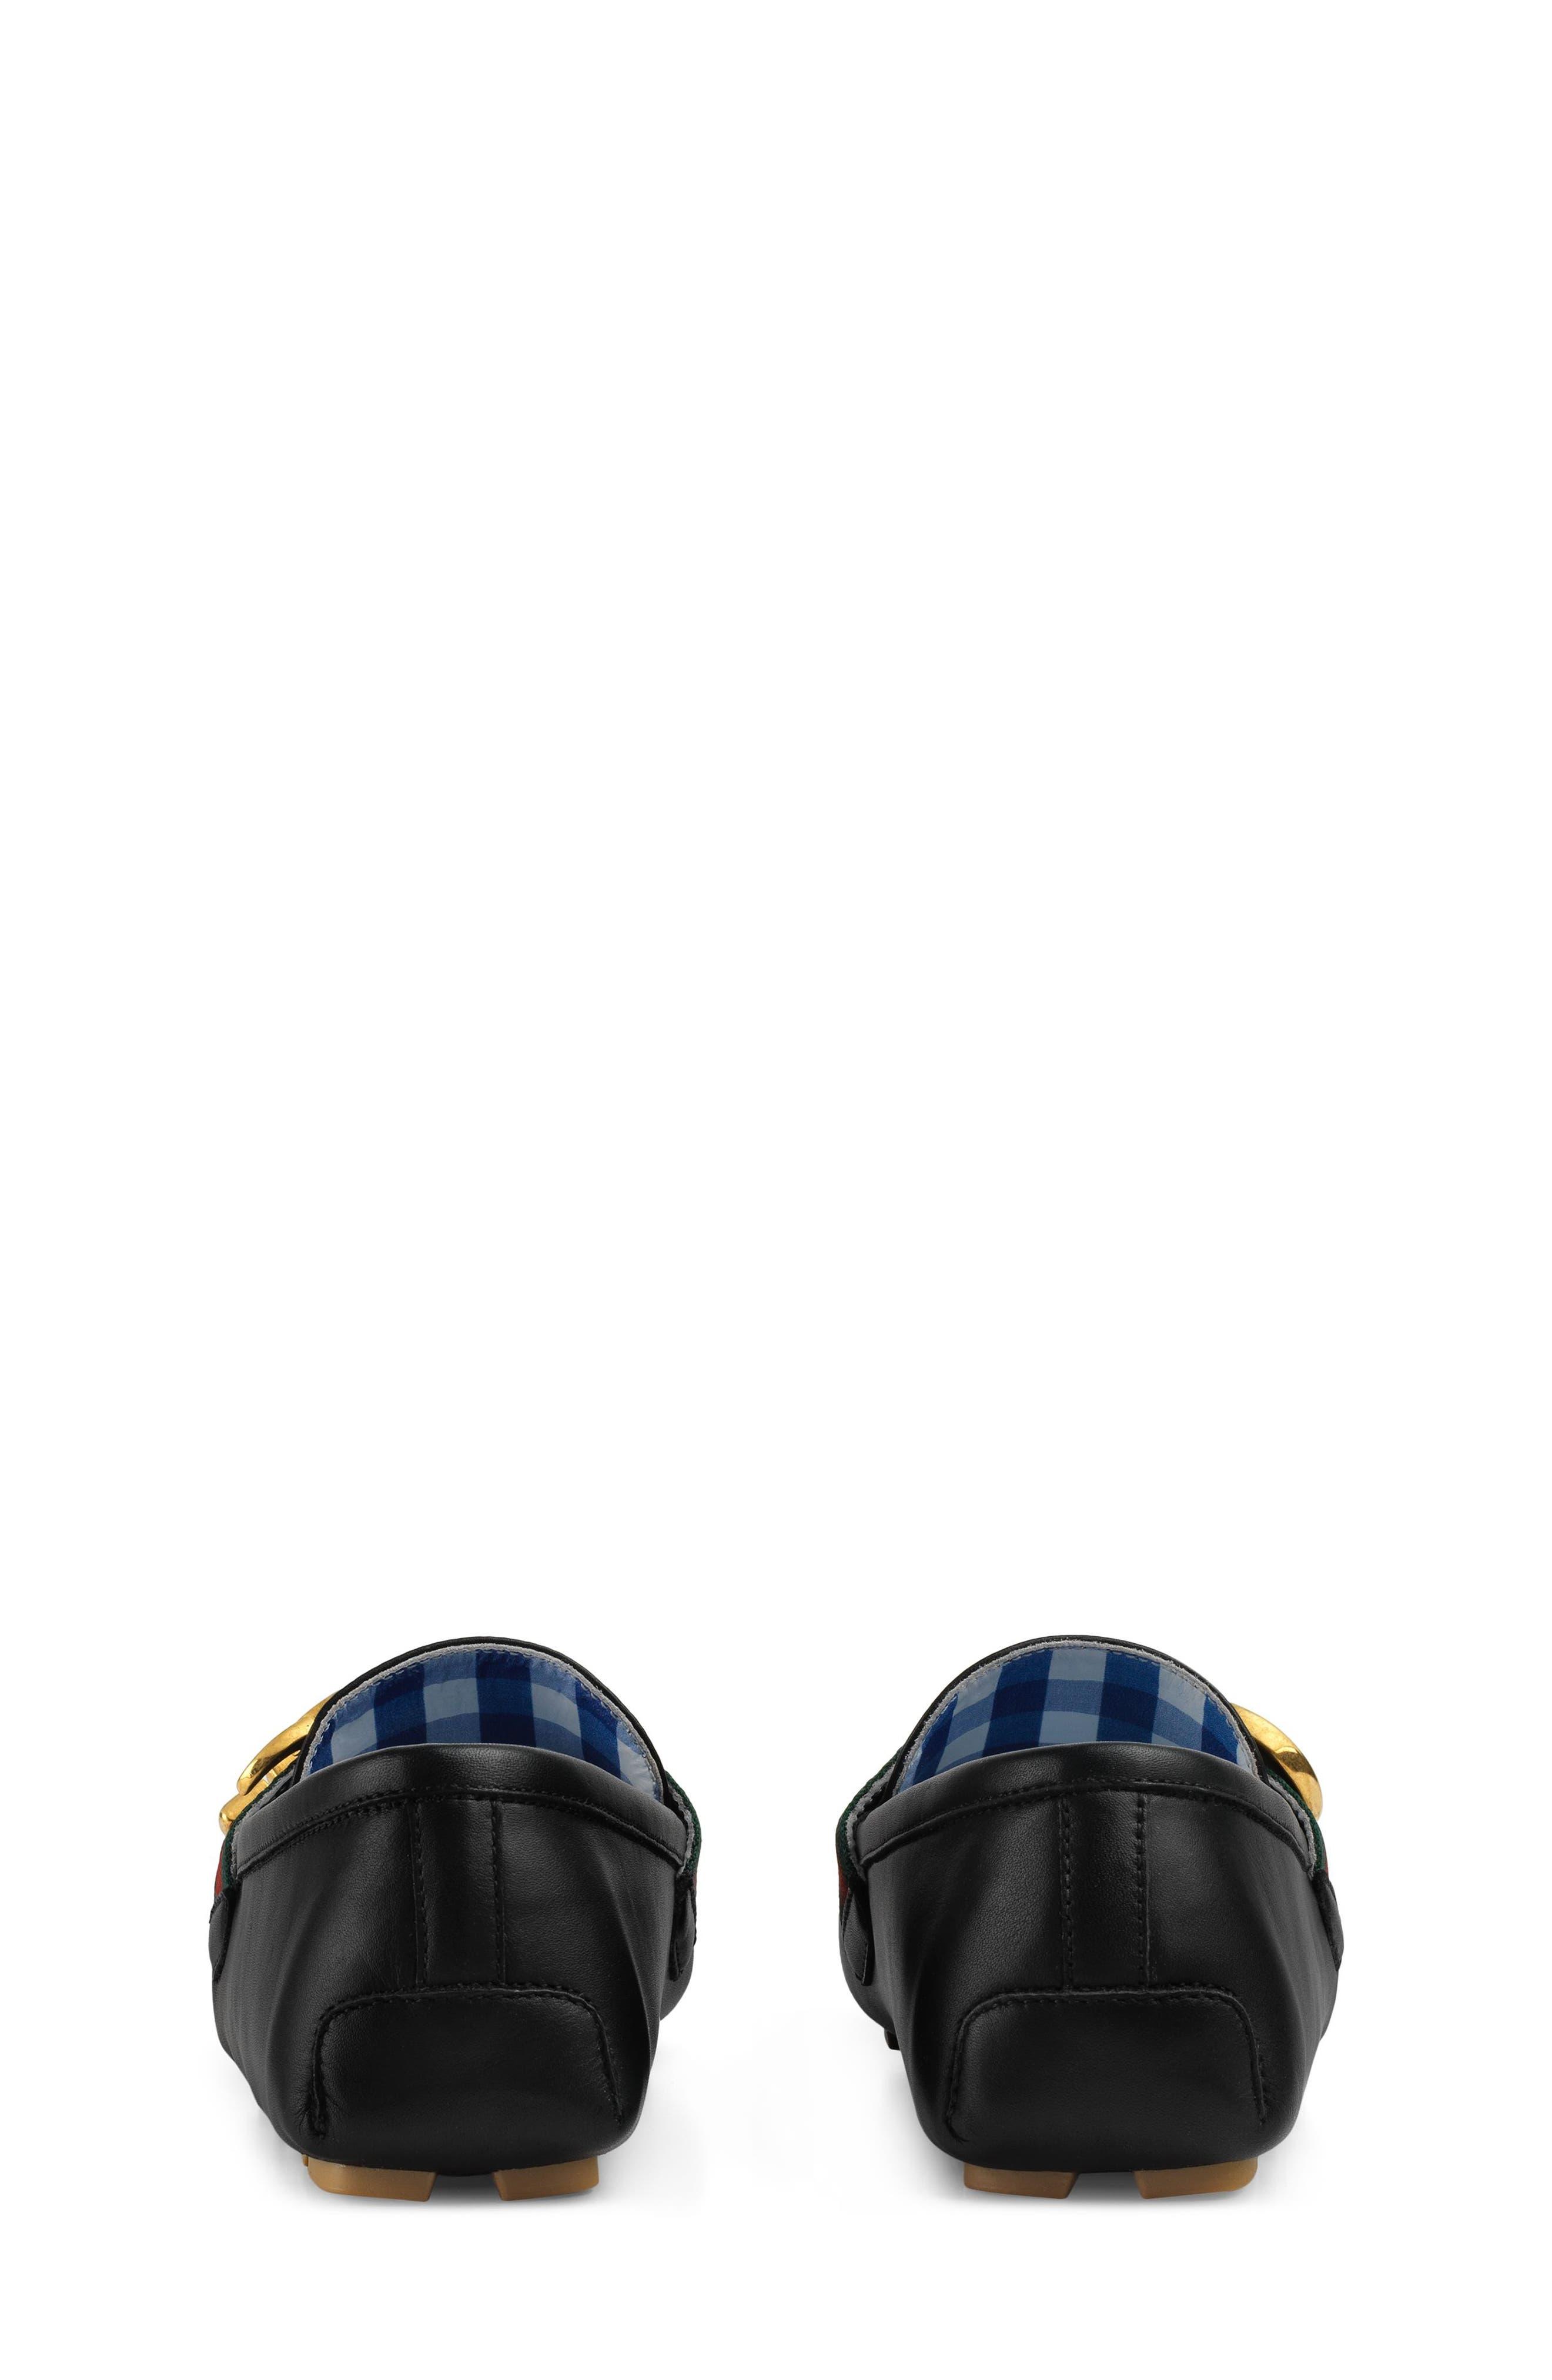 GUCCI, Noel Driving Loafer, Alternate thumbnail 7, color, BLACK